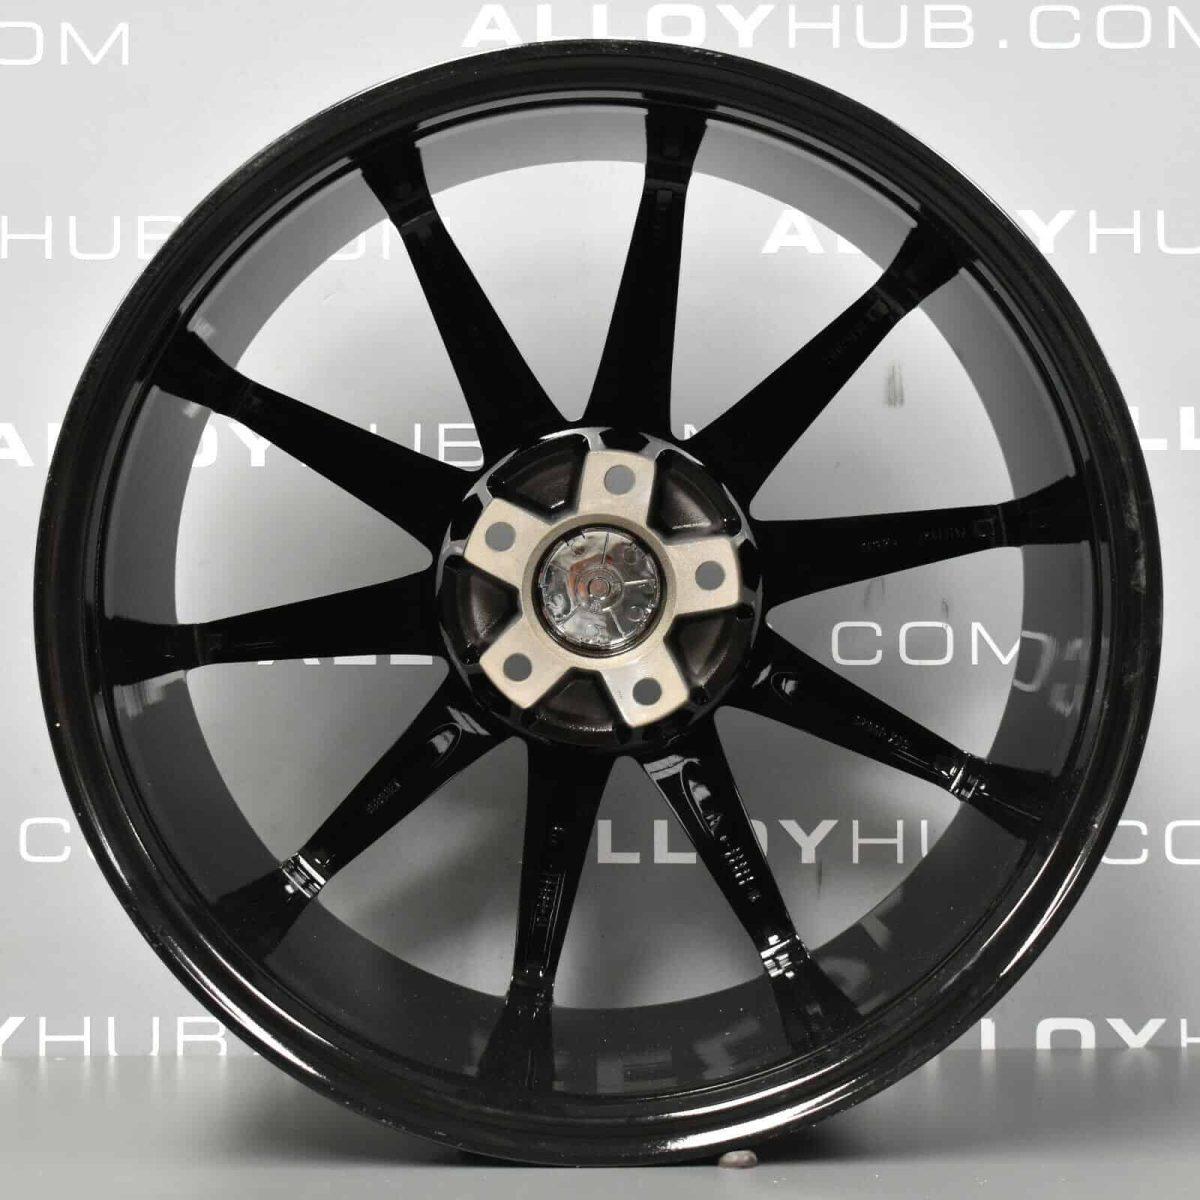 "Genuine Vea Borbet VW Amarok 10 Spoke 20"" Inch Alloy Wheel with Gloss Black Finish"